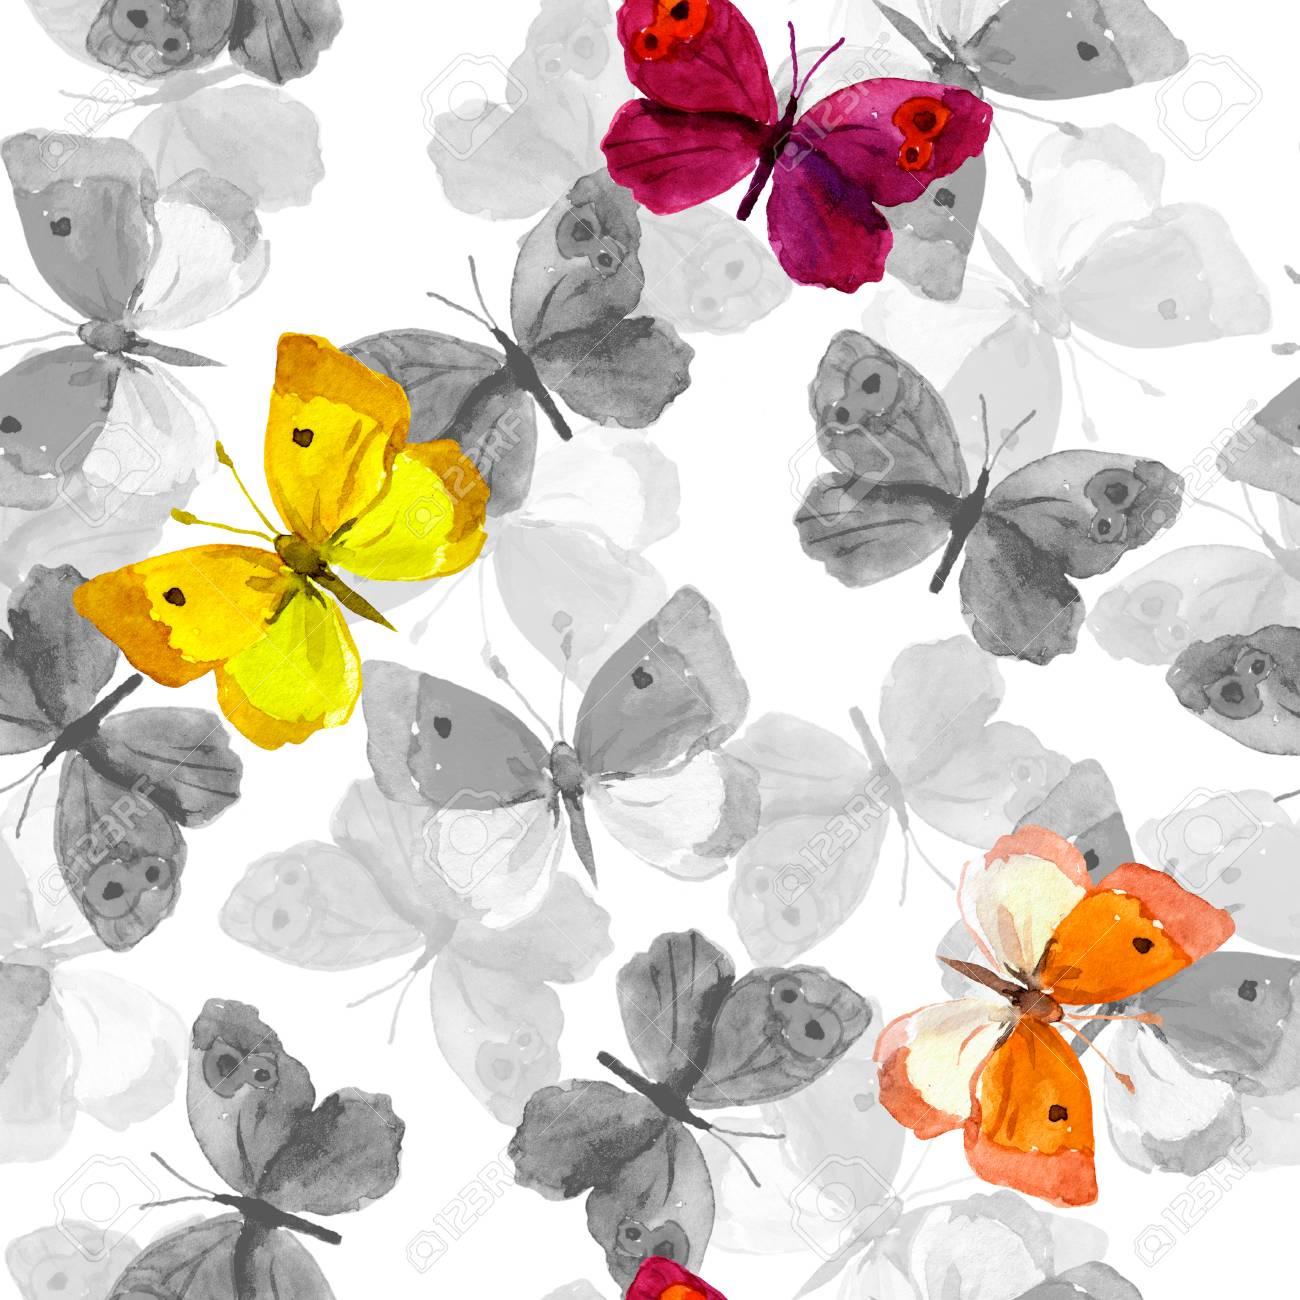 Sin Patrón Con La Mano Decorativo Pintadas Mariposas Dibujo